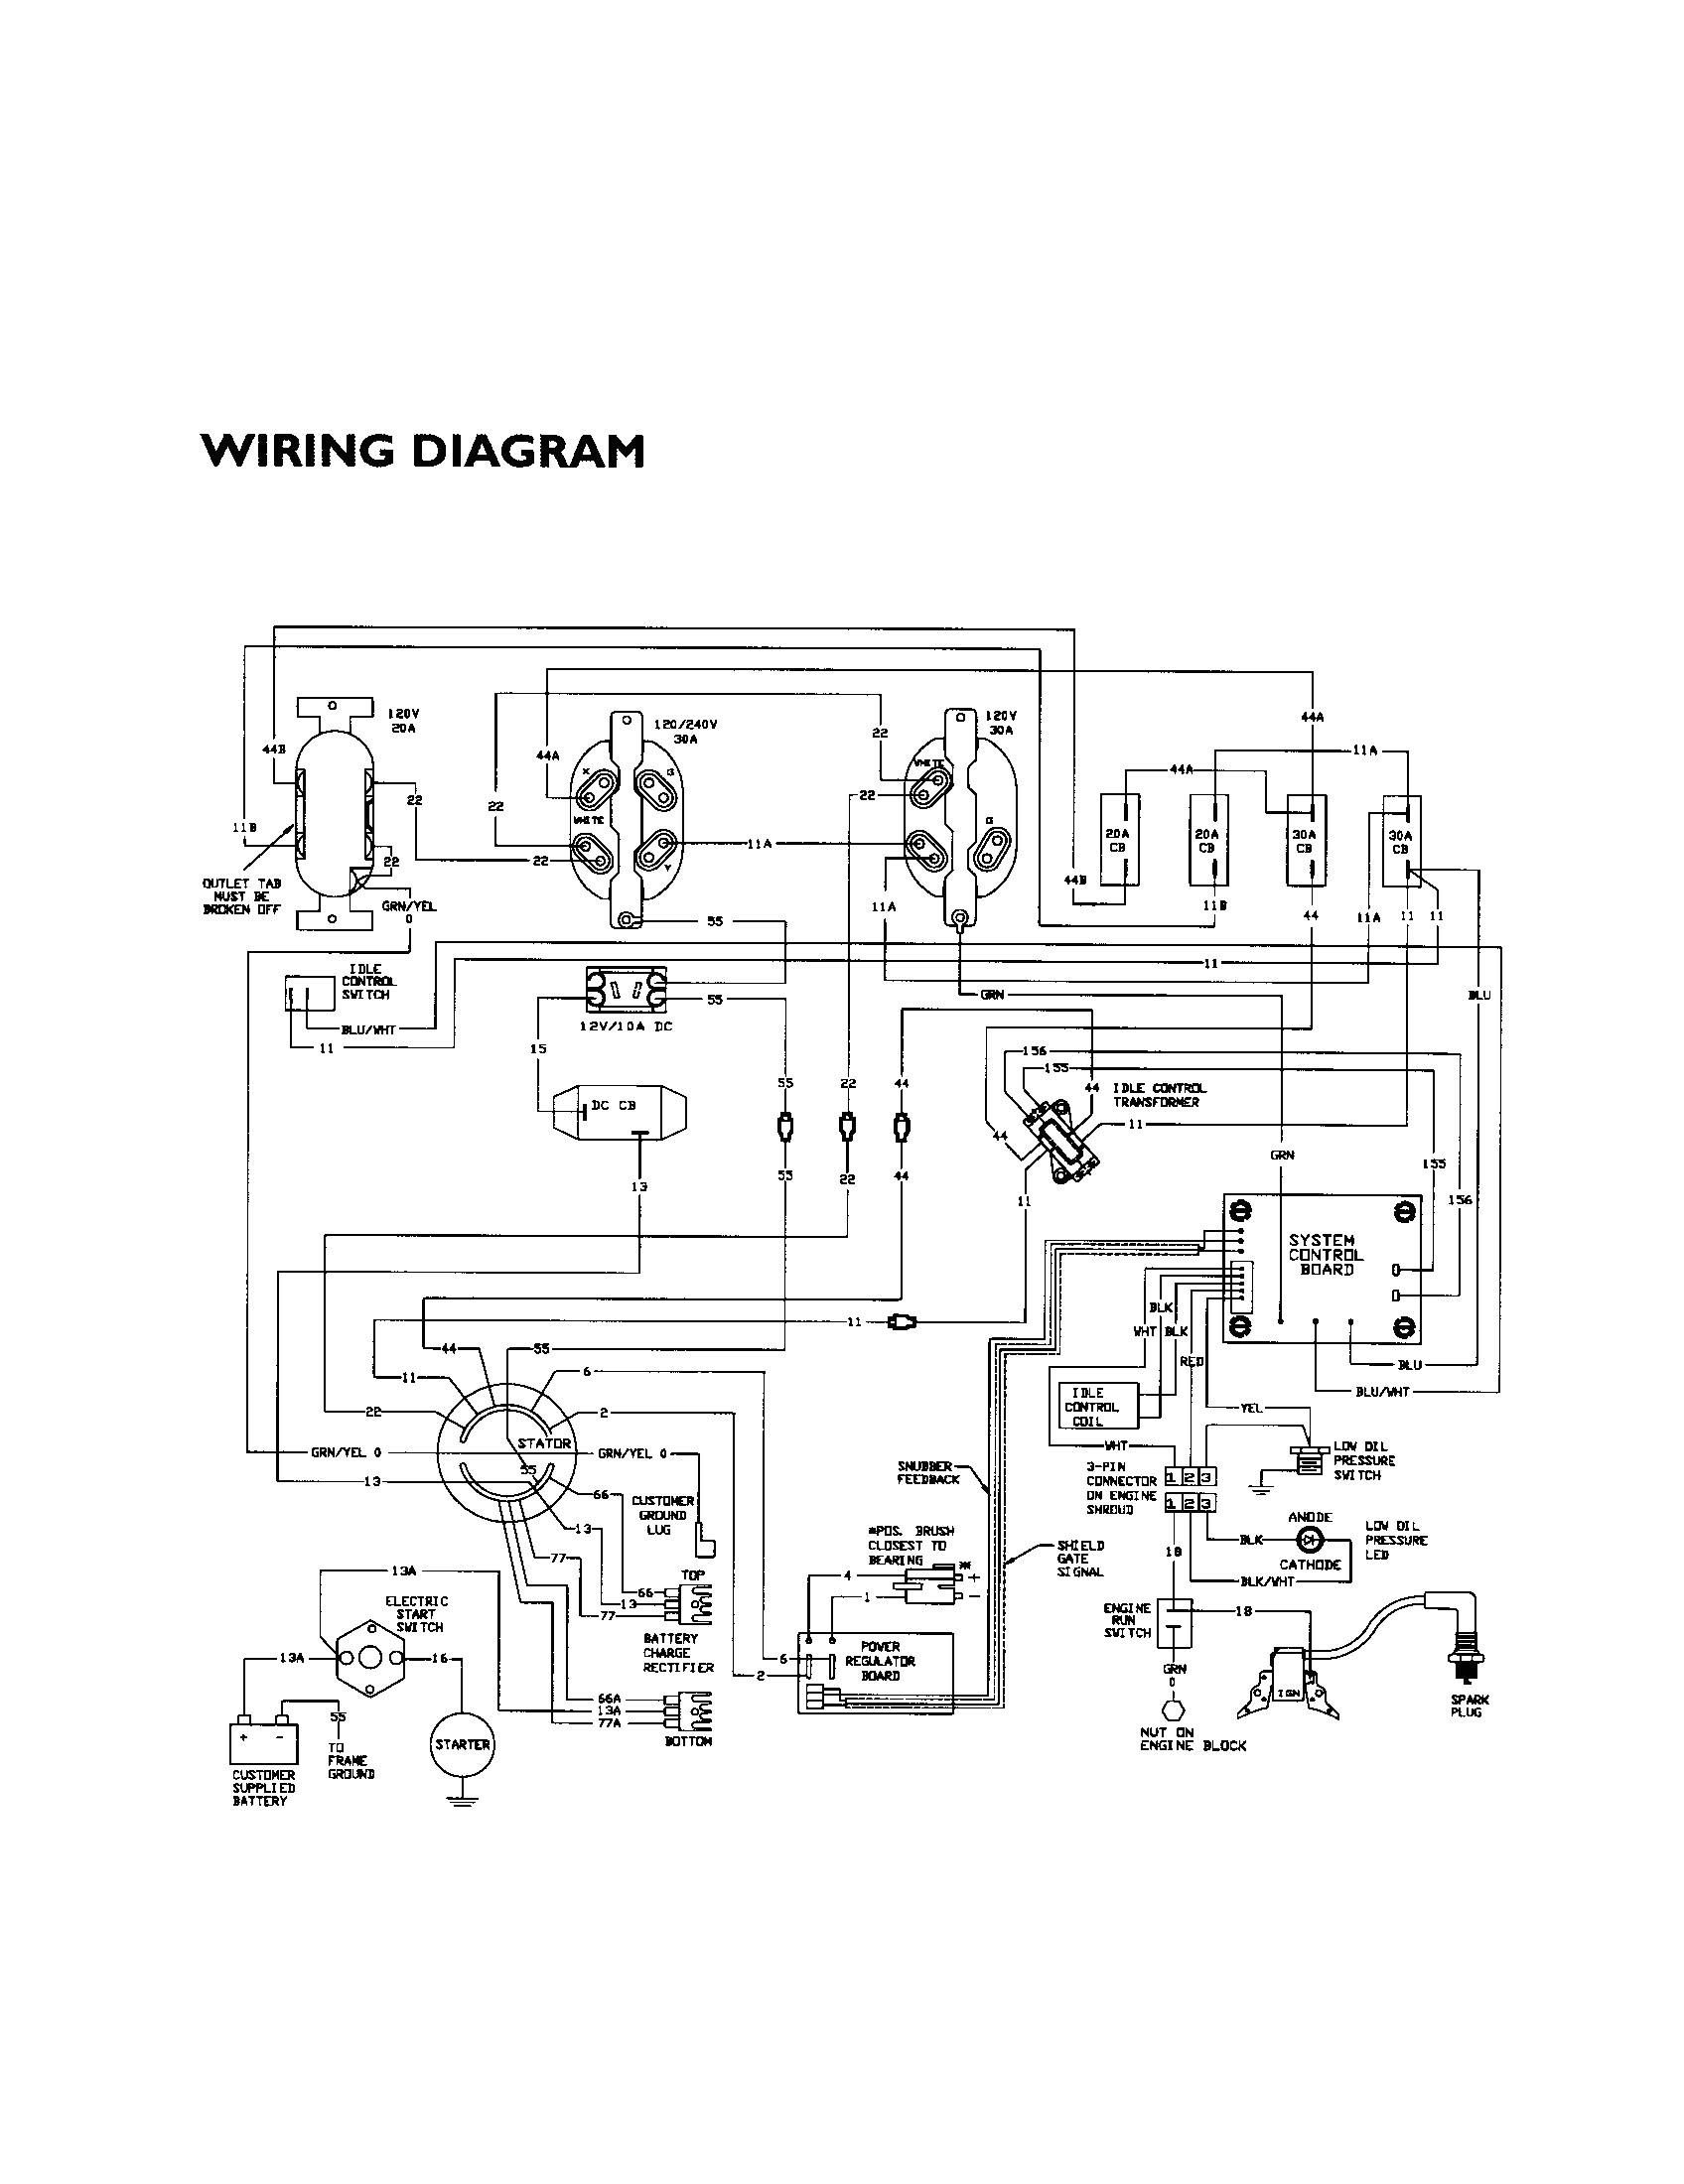 generac generator wiring diagram wiring diagram for generac generator wire center u2022 rh 66 42 83 38 generac generator wiring 20a jpg